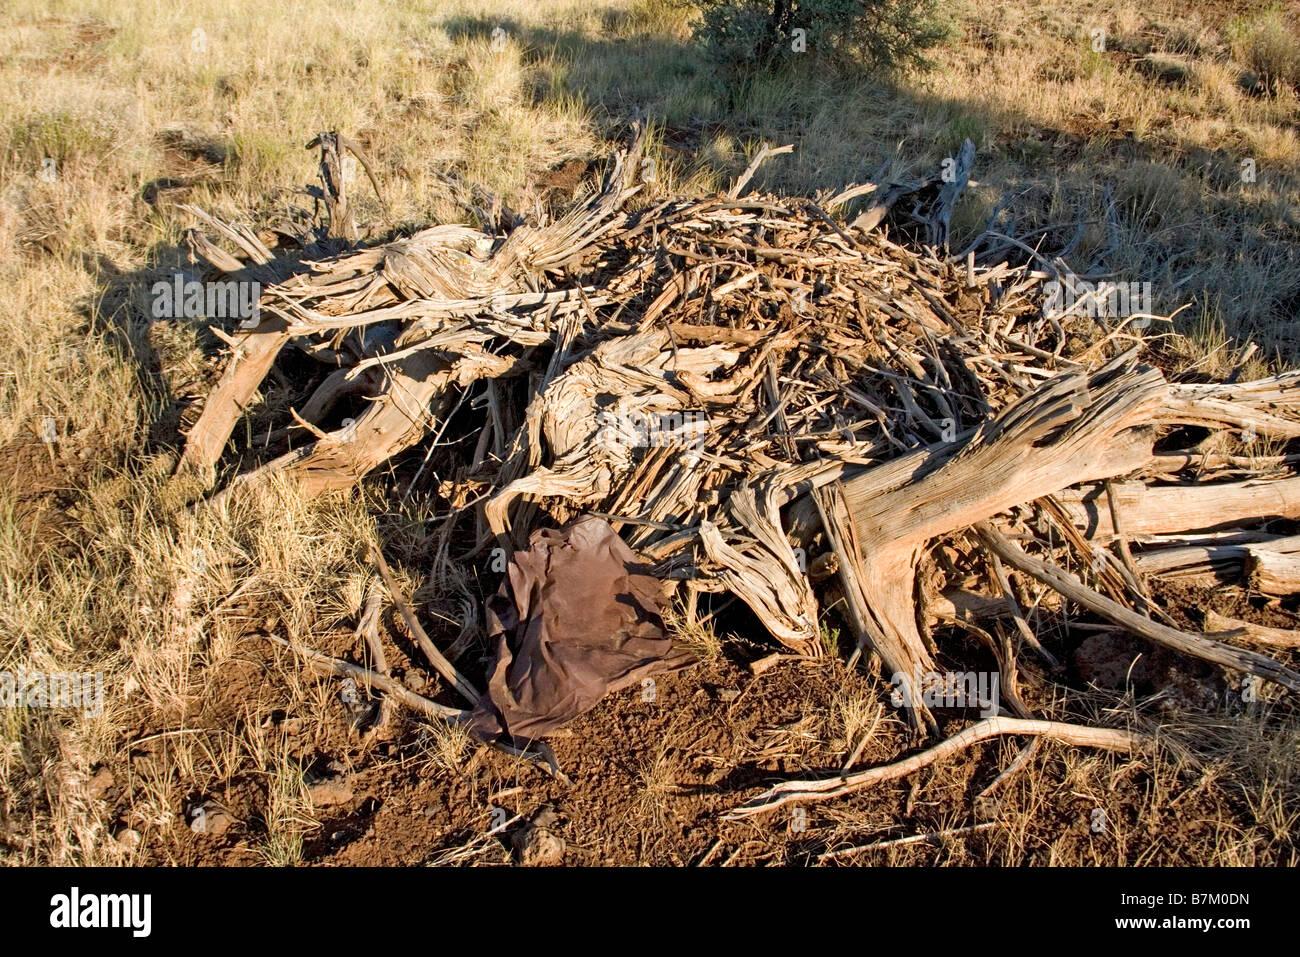 Stephen's Woodrat midden (nest) Neotoma stephensi near Showlow Arizona United States 17 July midden Muridae - Stock Image